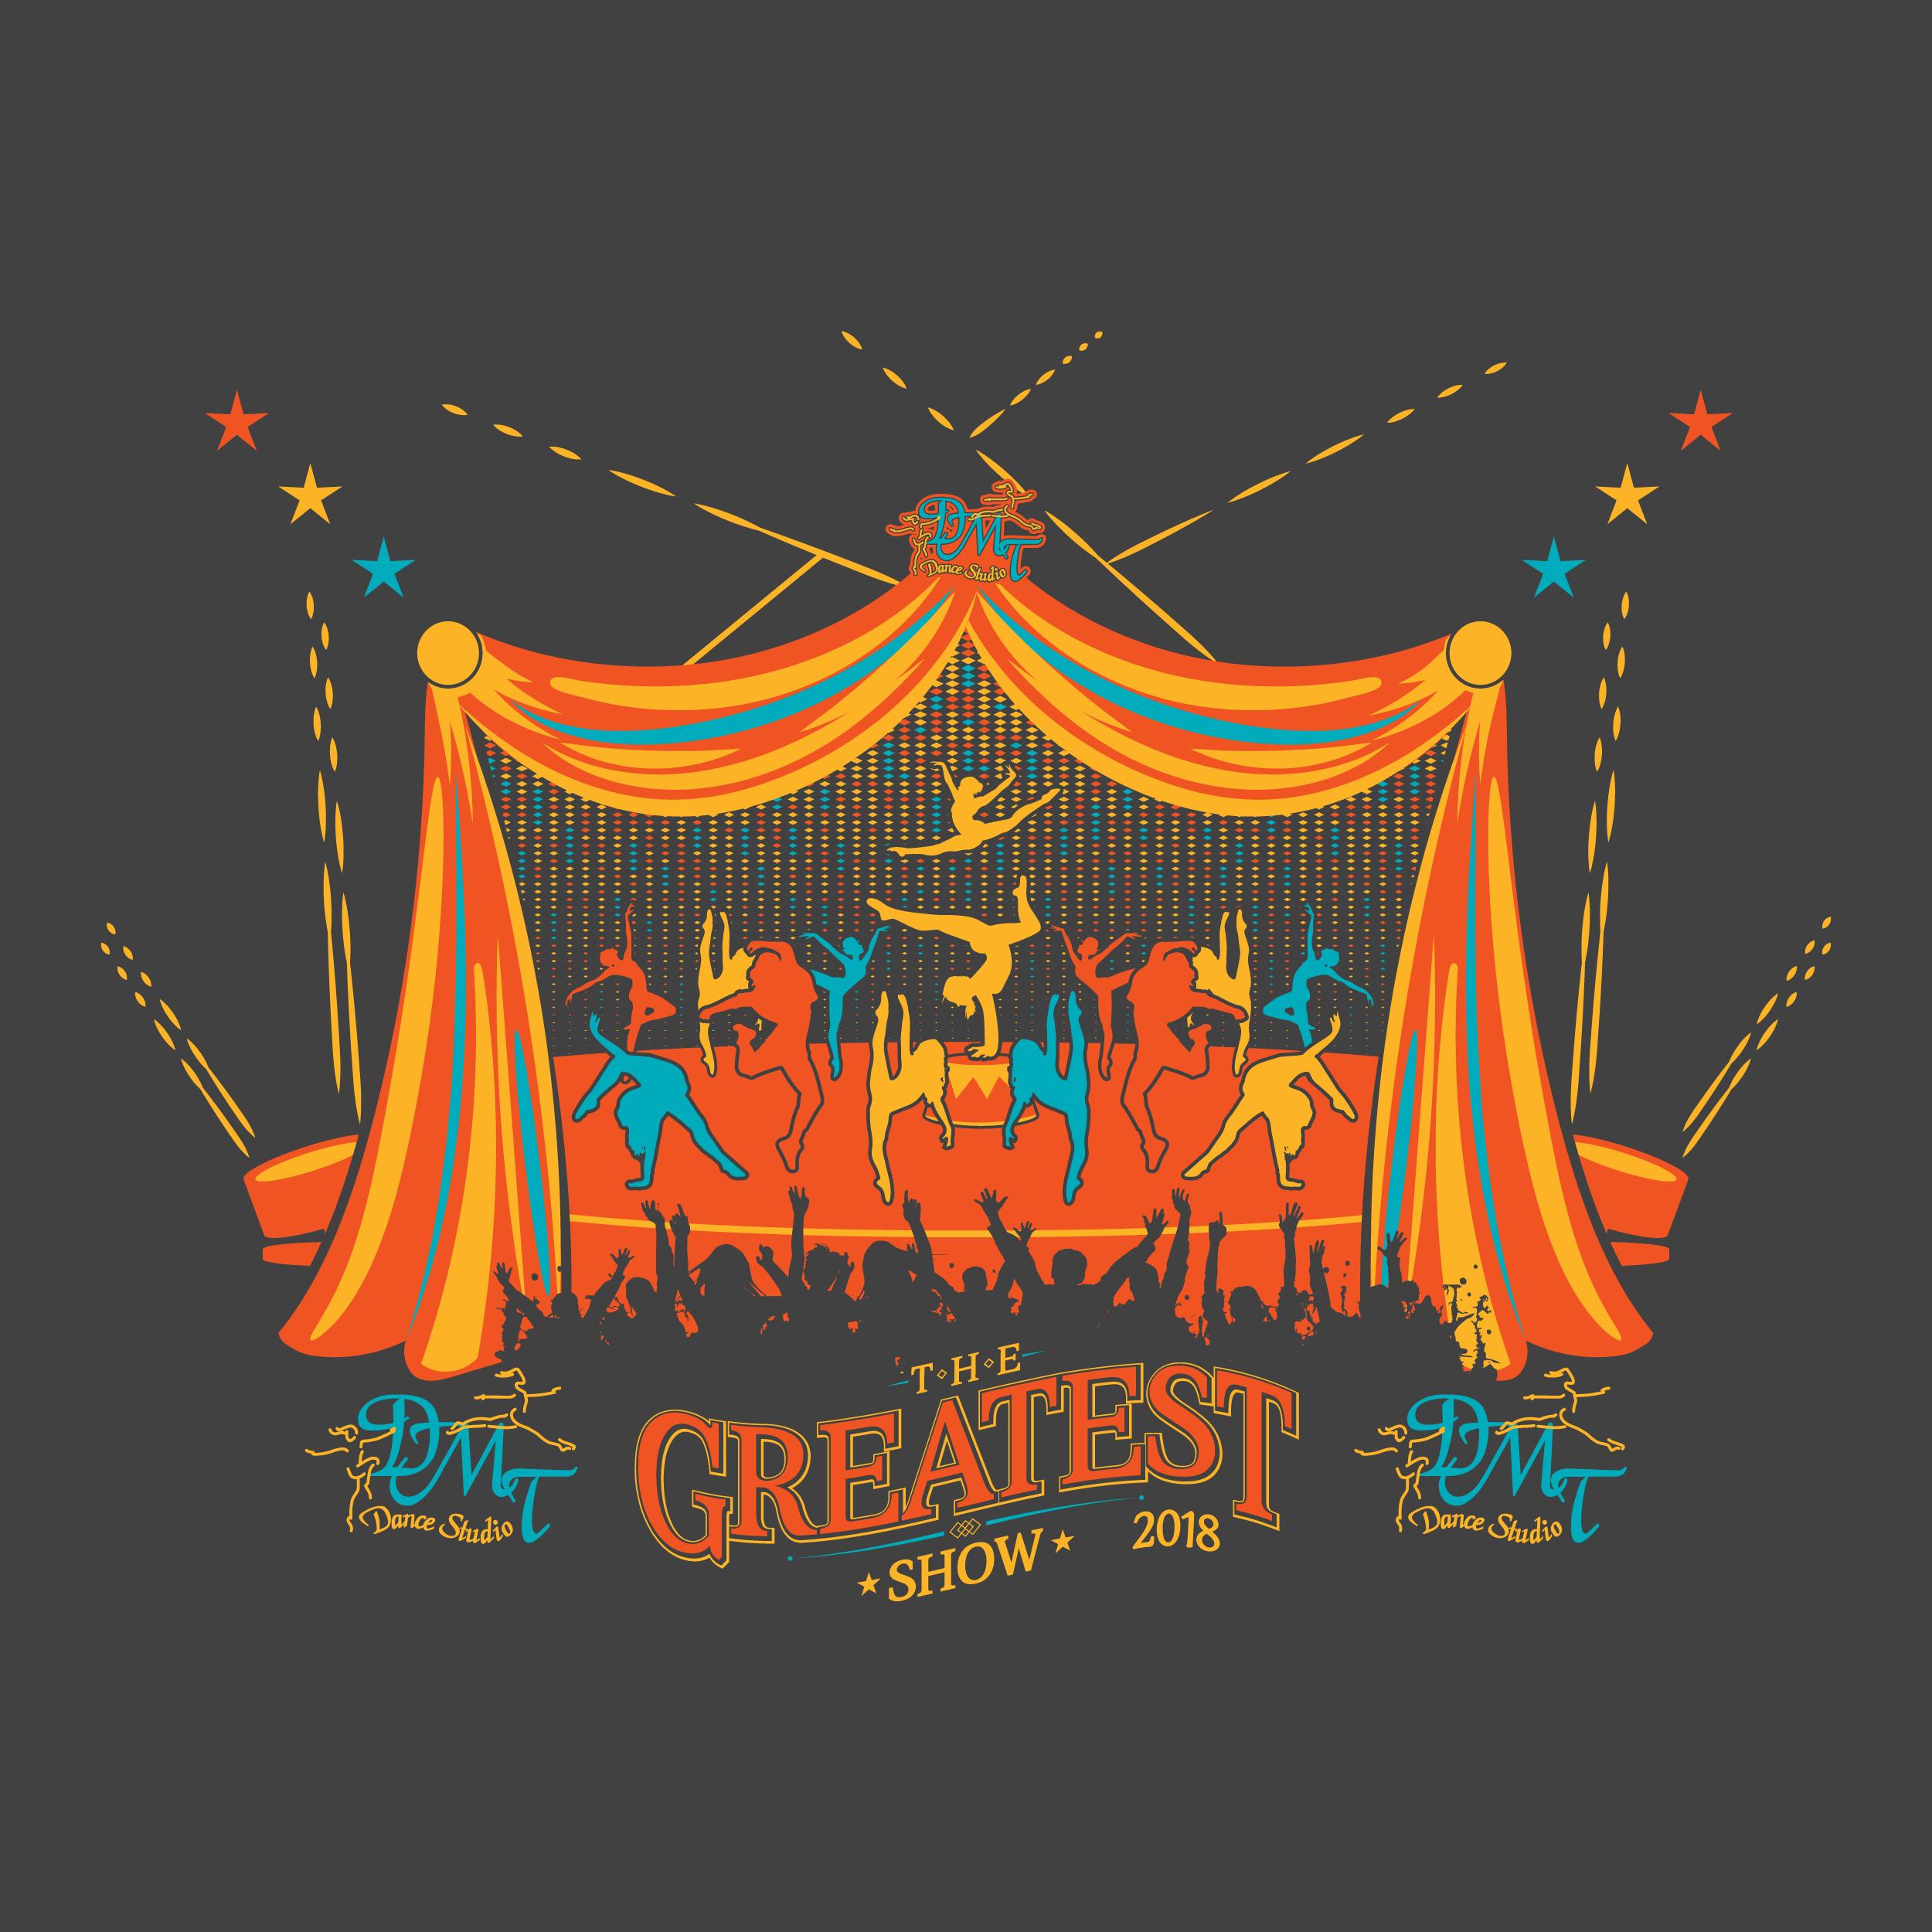 portfolio_dmt_greatestshow_shirt-01.png